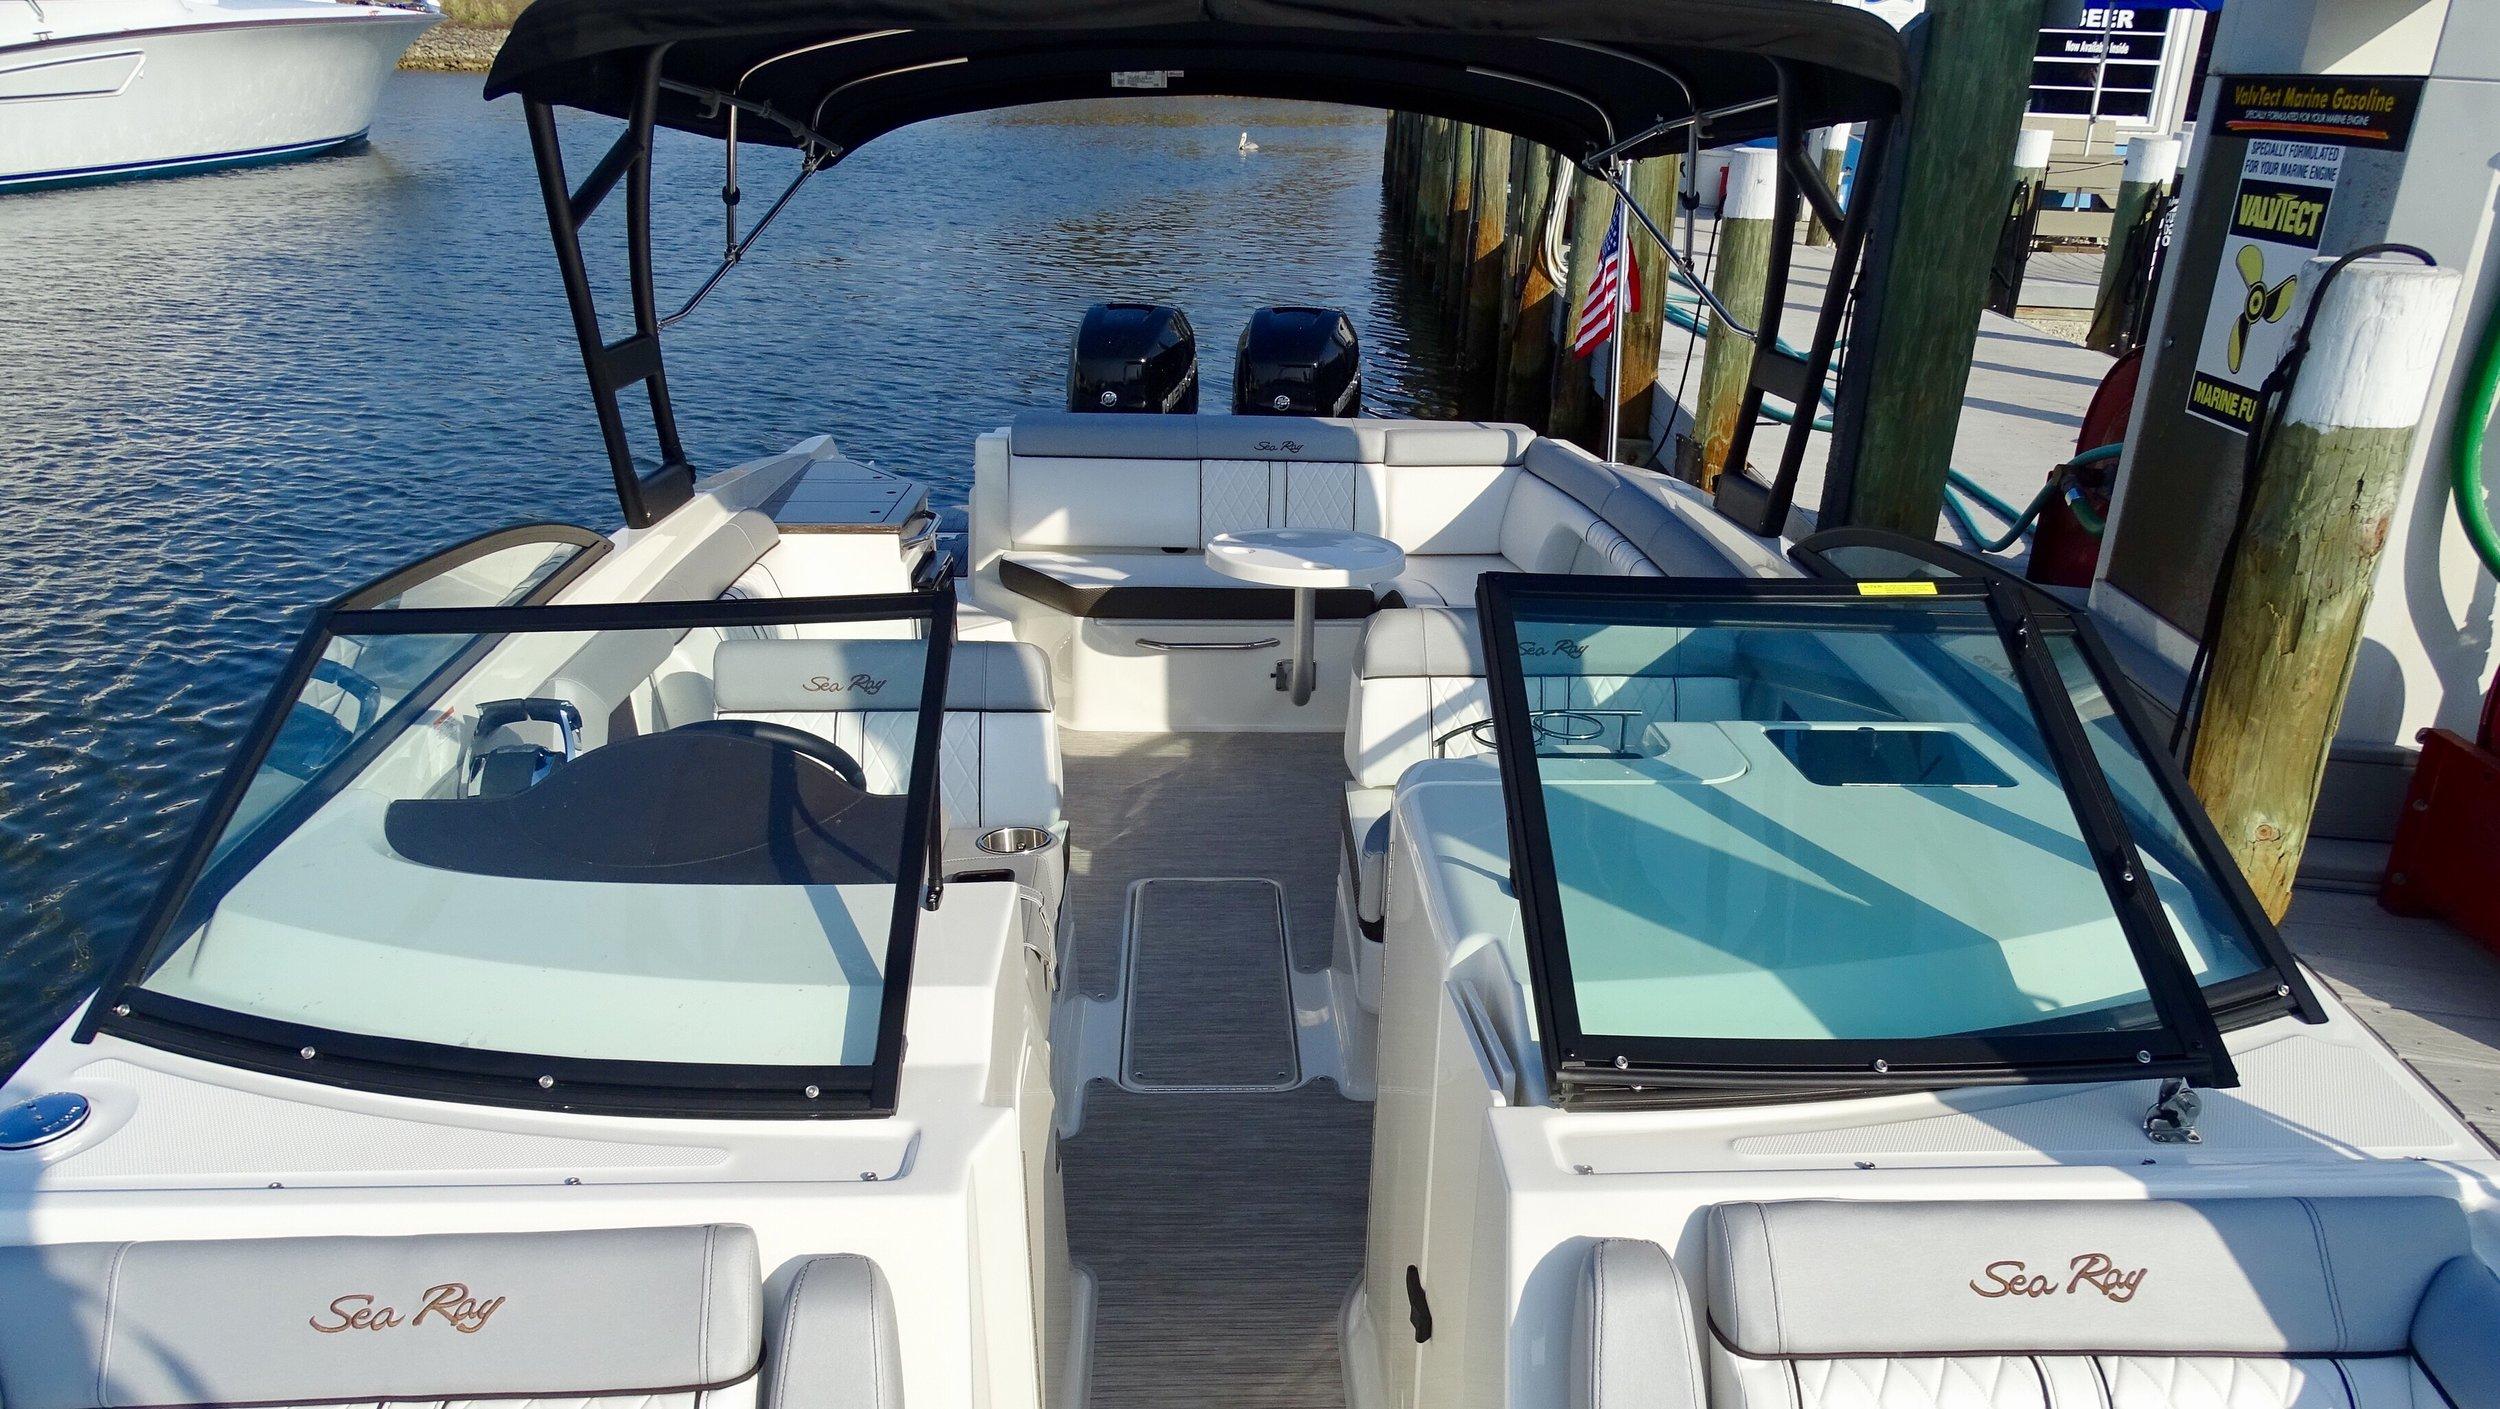 Sarasota Boat Tours.JPG